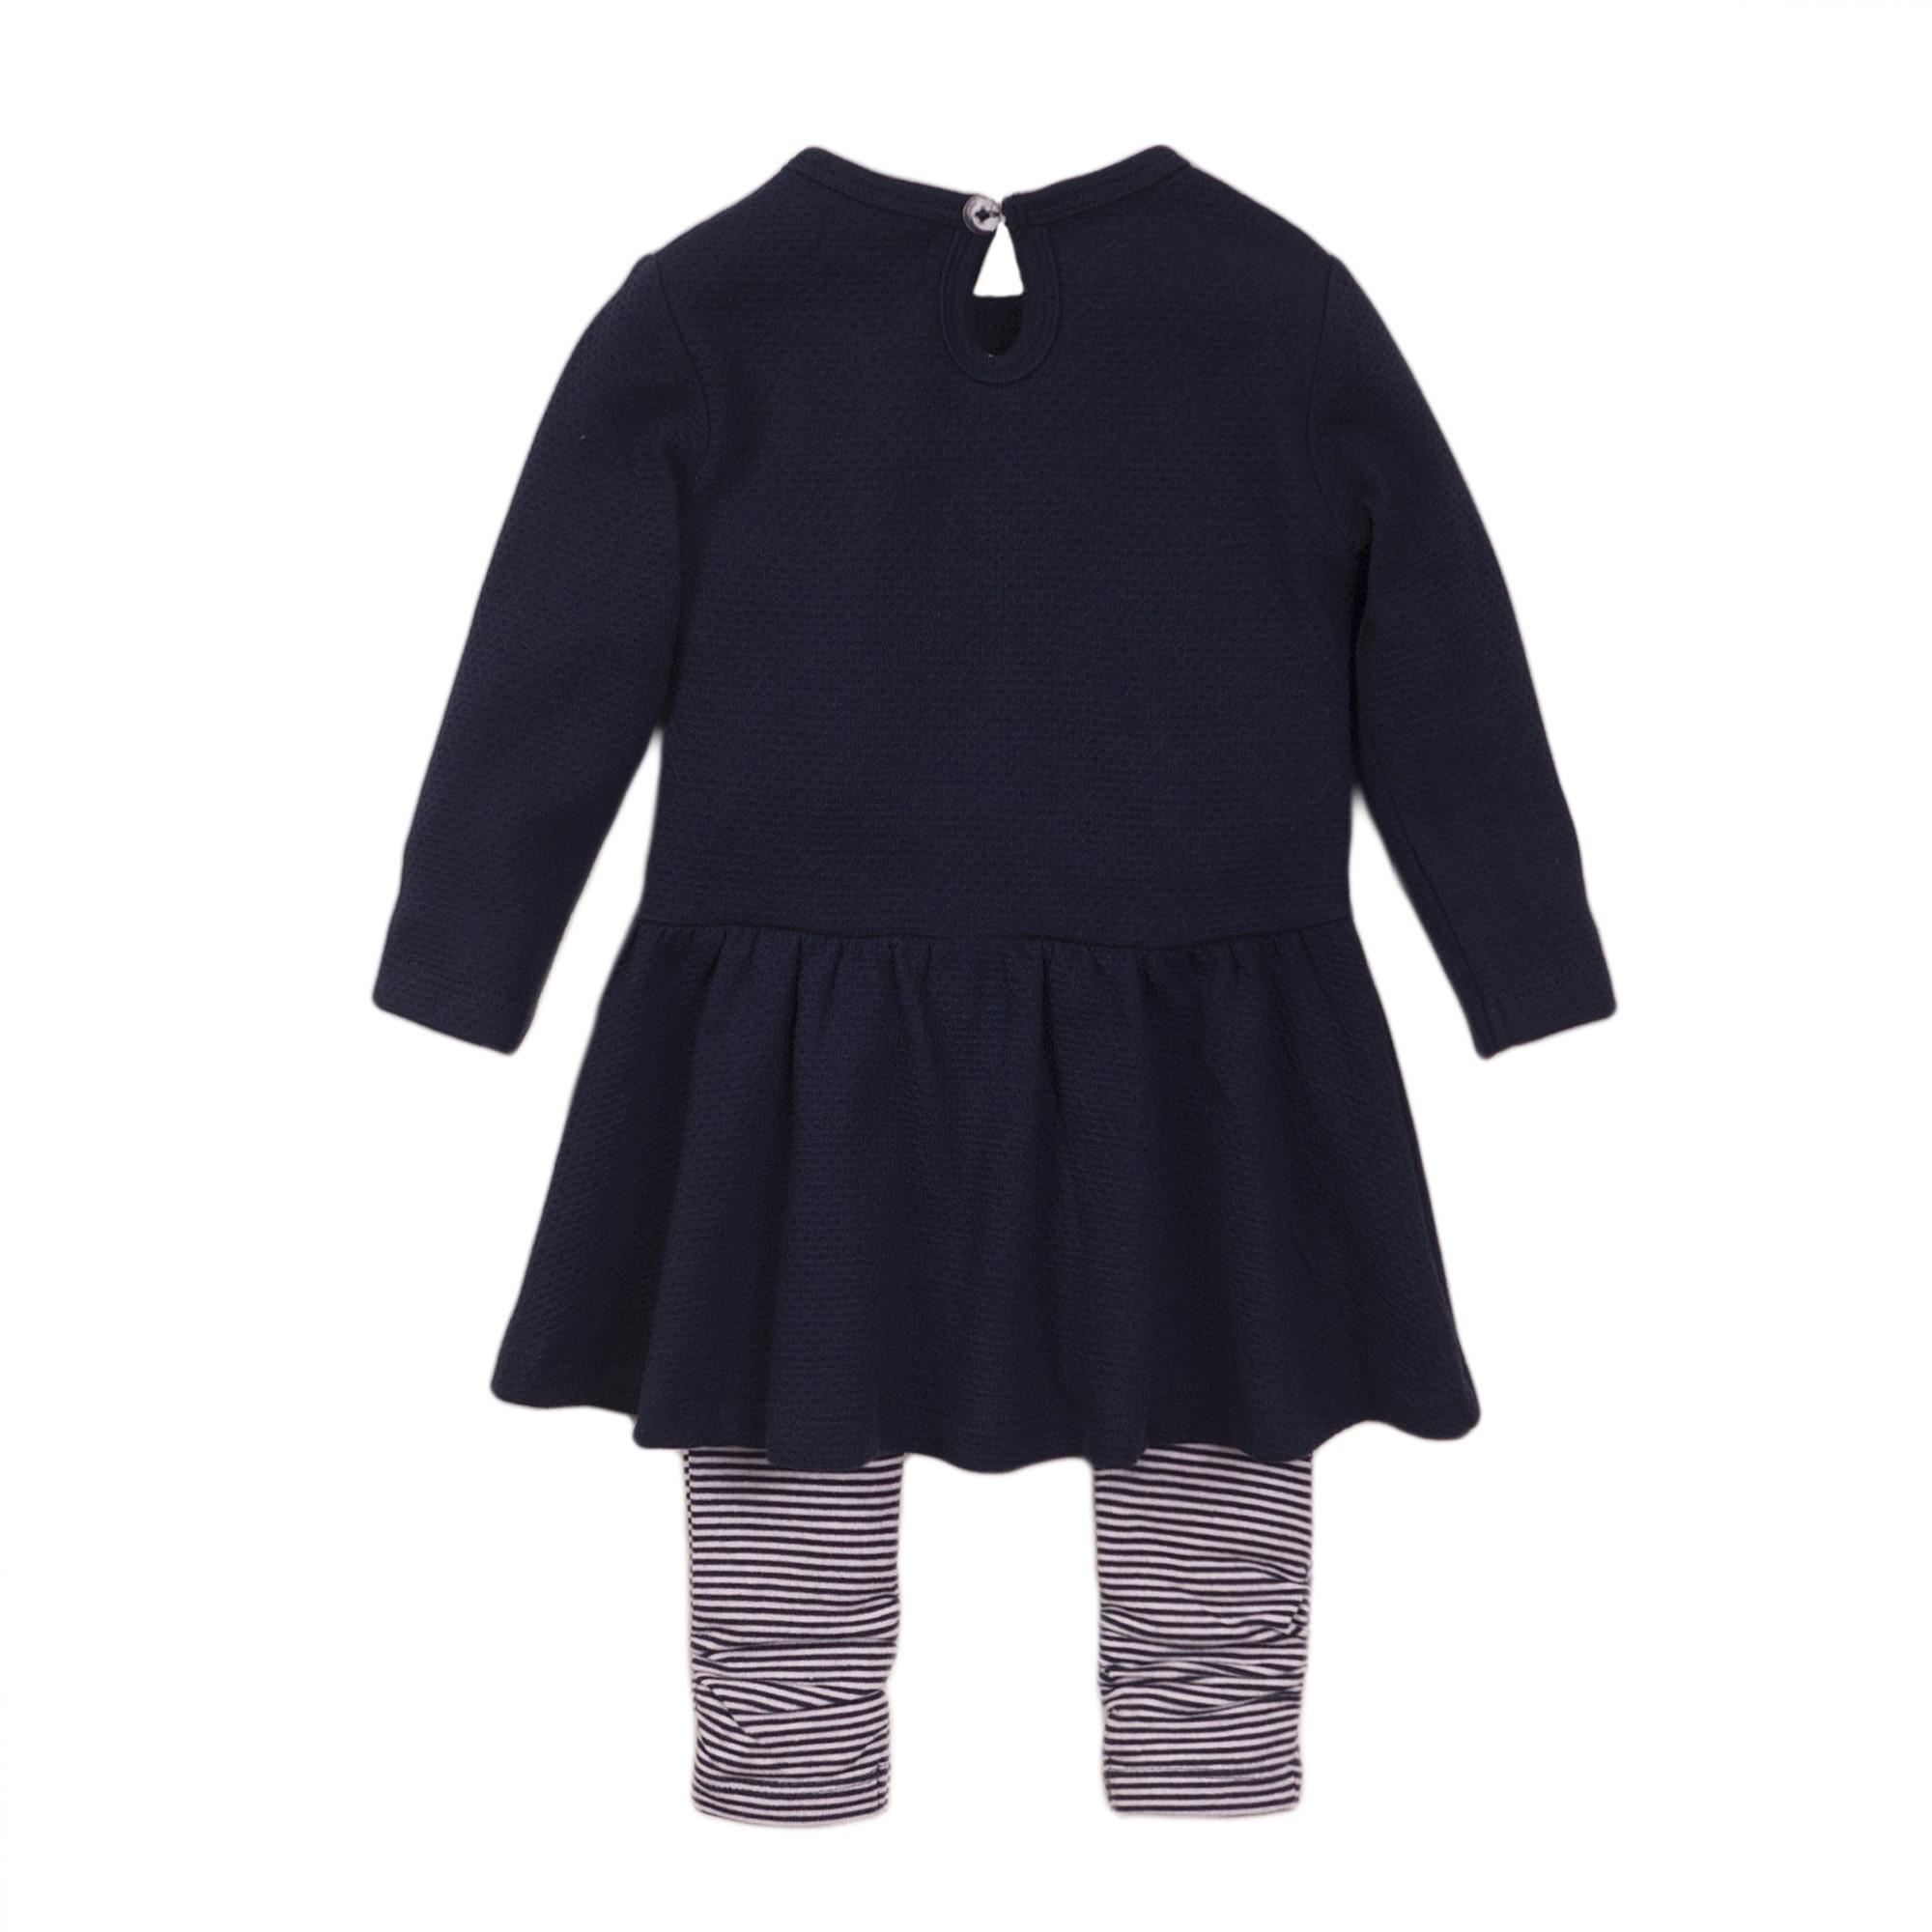 Wonderful Dress & Legging Set